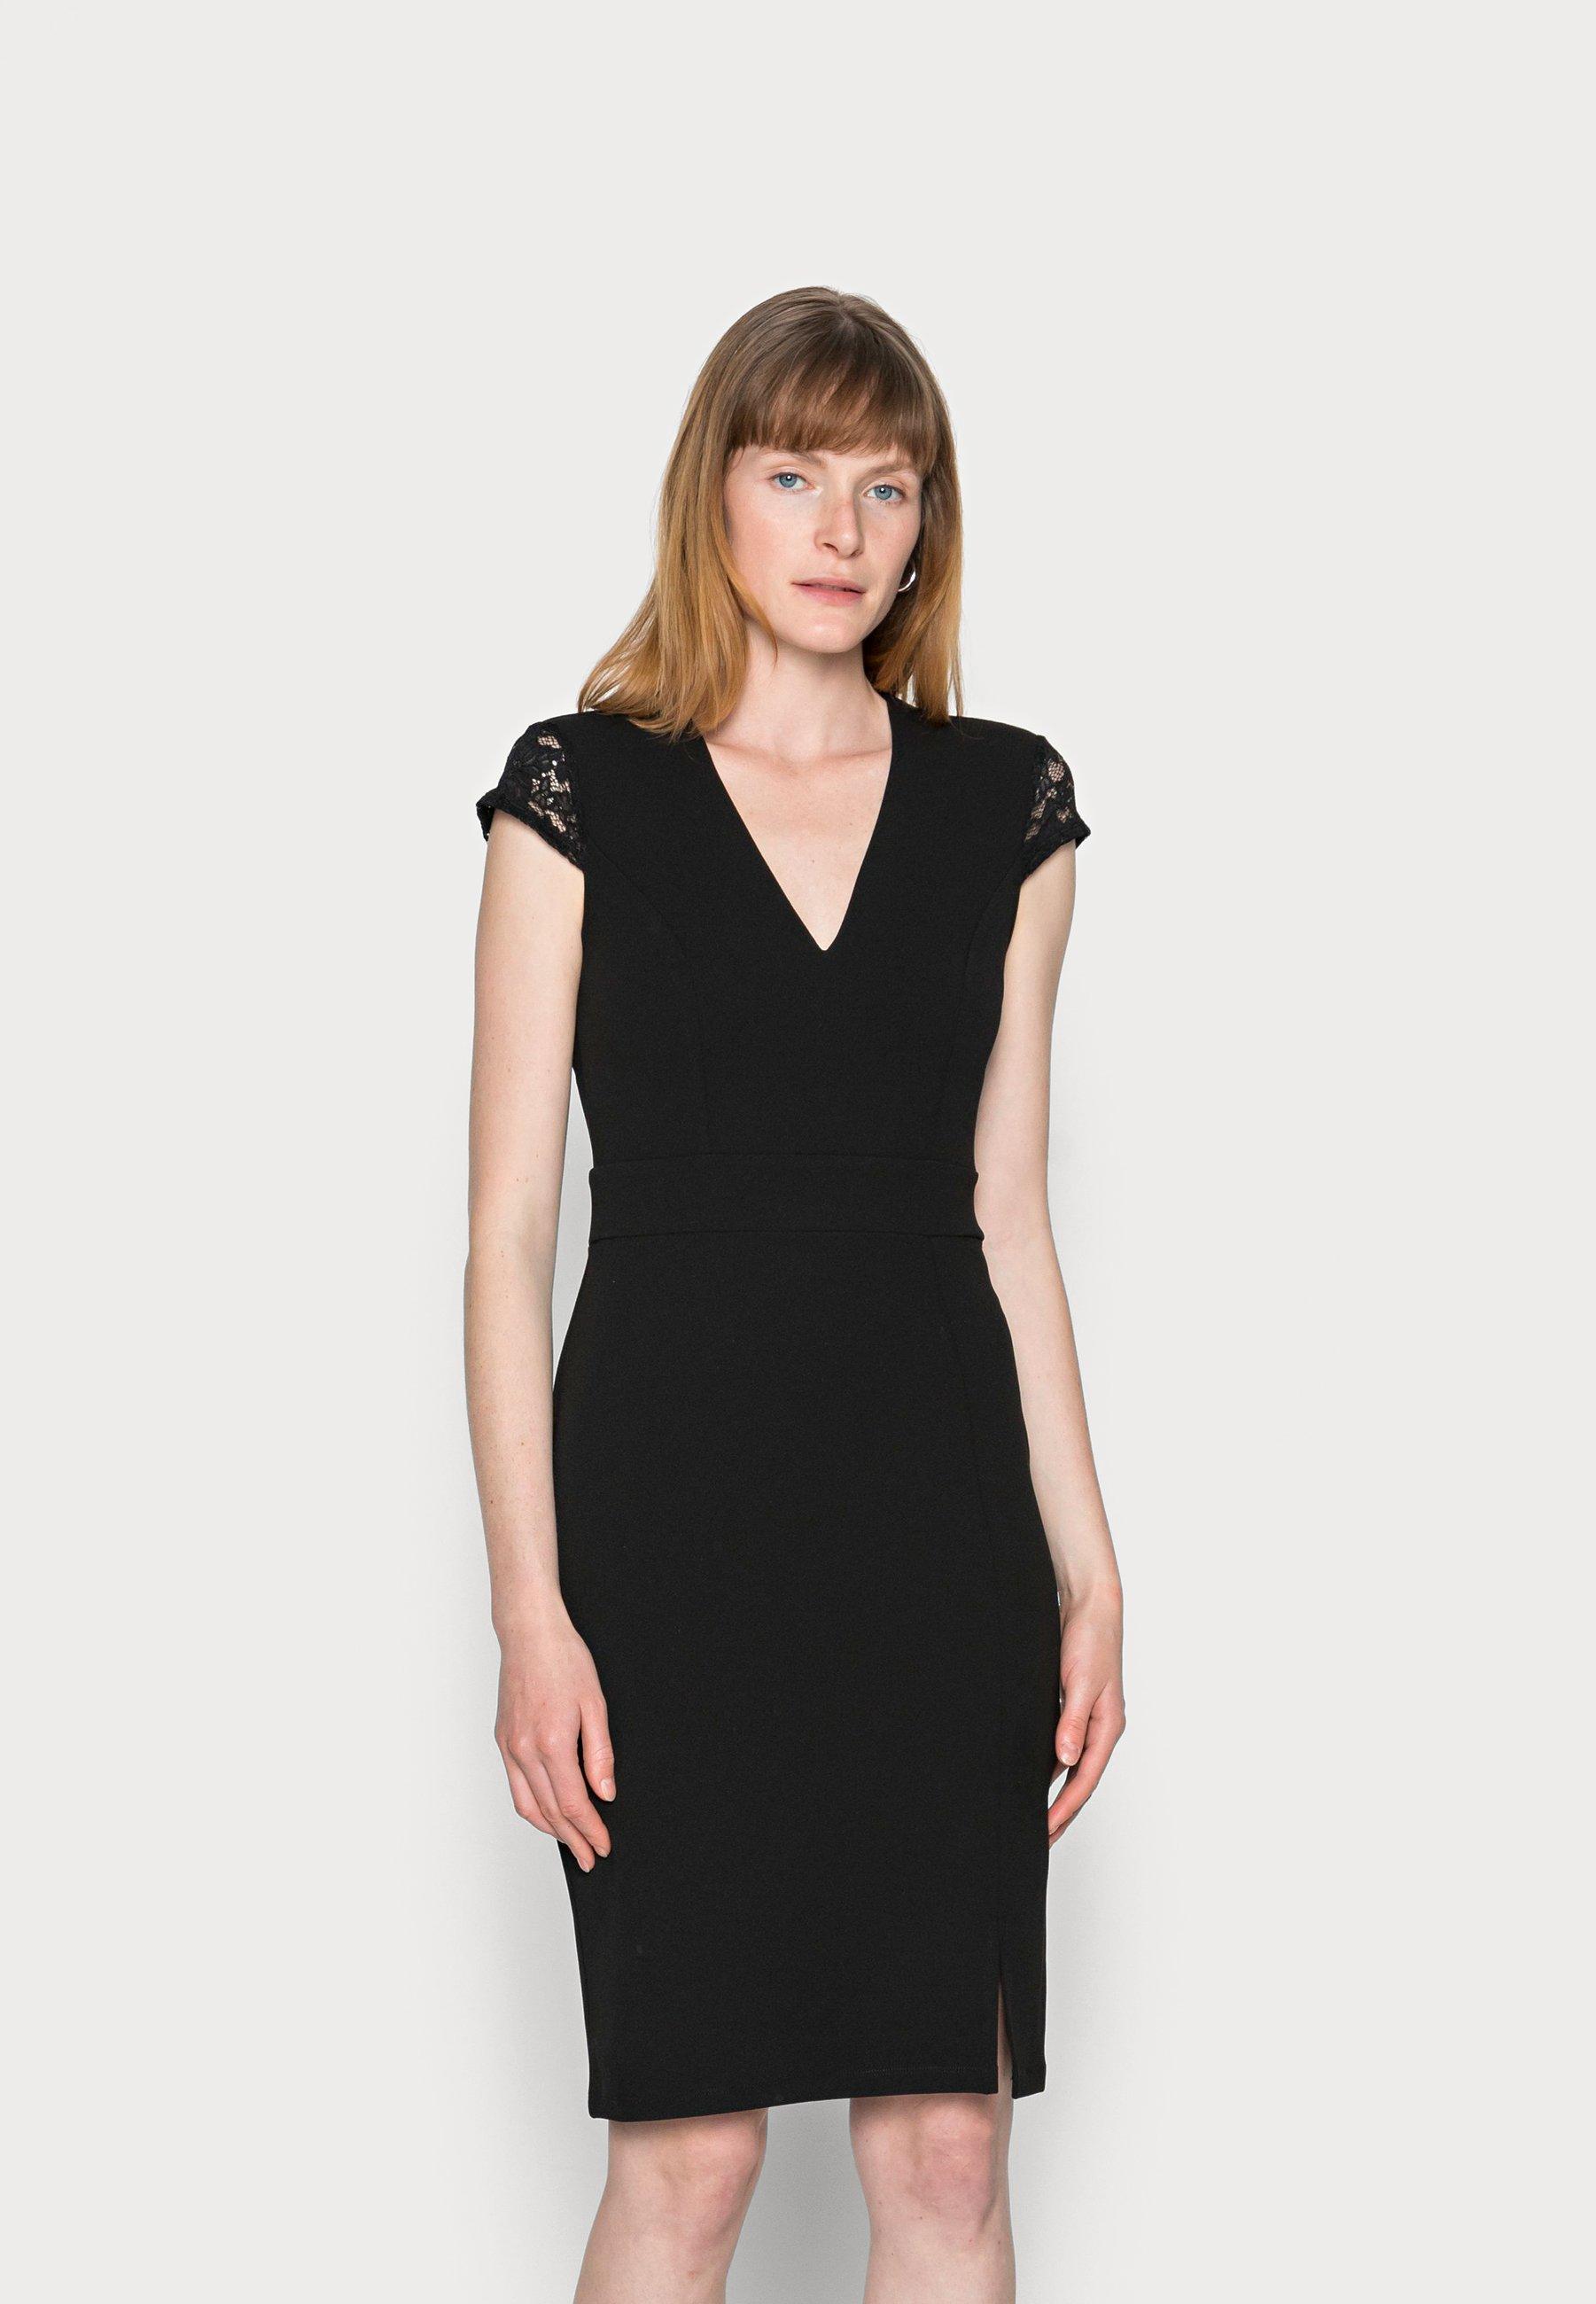 Damen LACE CAP SLEEVES POLYCREPE OCCASION MINI DRESS (AN-AW21-C007-SJ) - Cocktailkleid/festliches Kleid